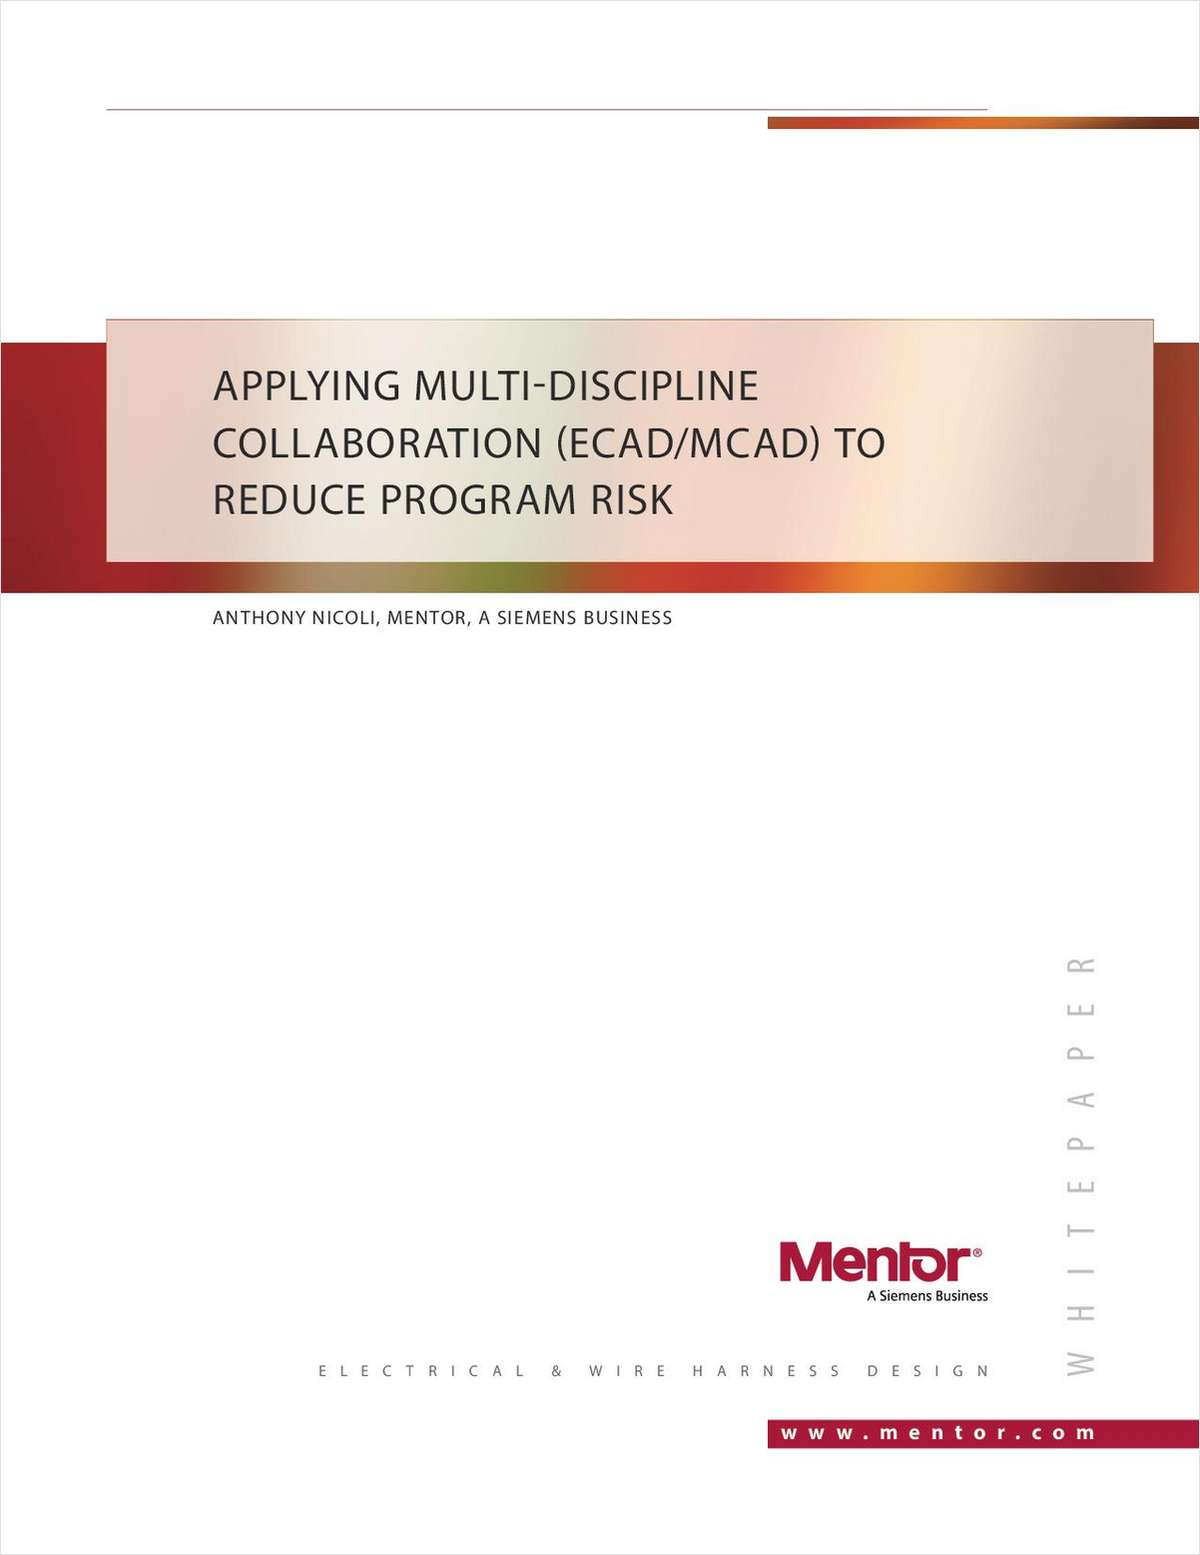 Applying Multi-Discipline Collaboration (ECAD/MCAD) to Reduce Program Risk